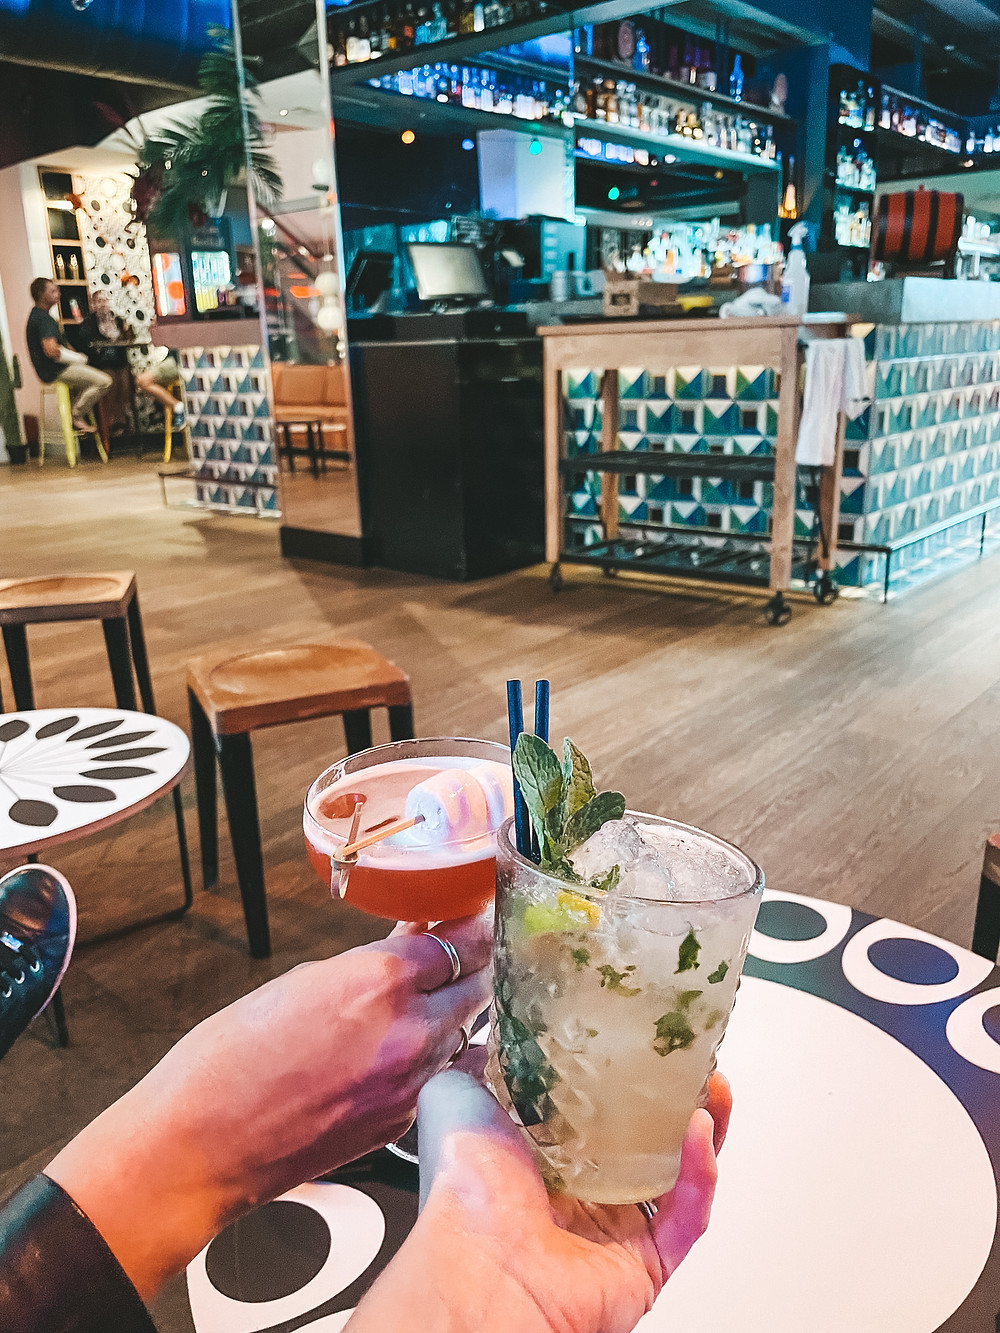 Cocktails at Stingray bar, QT Hotel Gold Coast